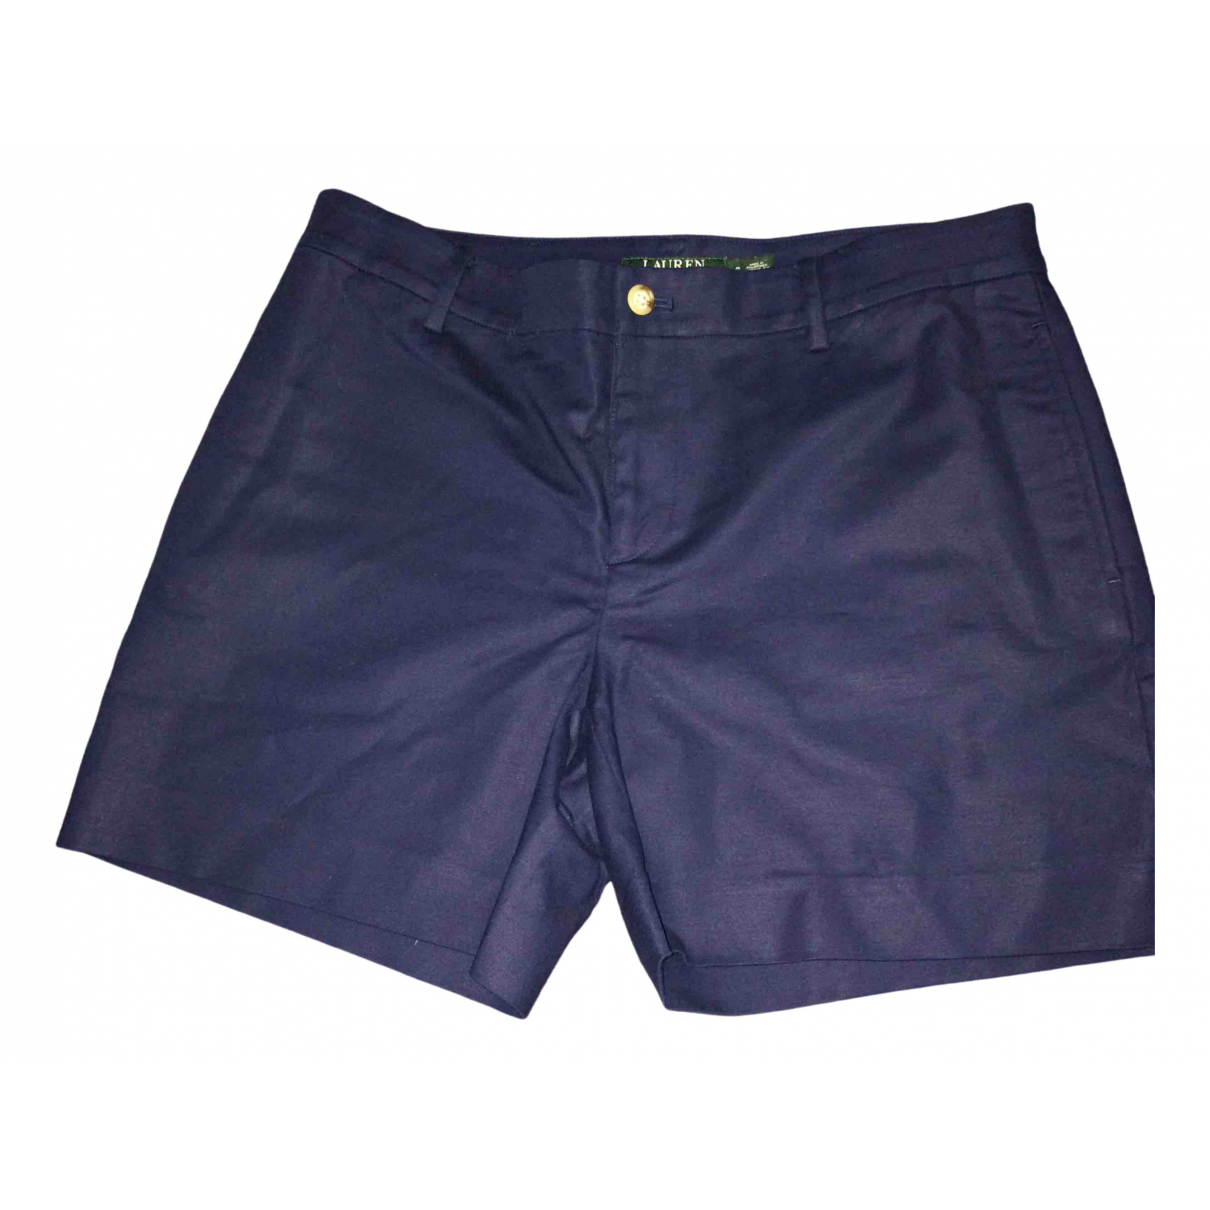 Lauren Ralph Lauren \N Shorts in  Blau Baumwolle